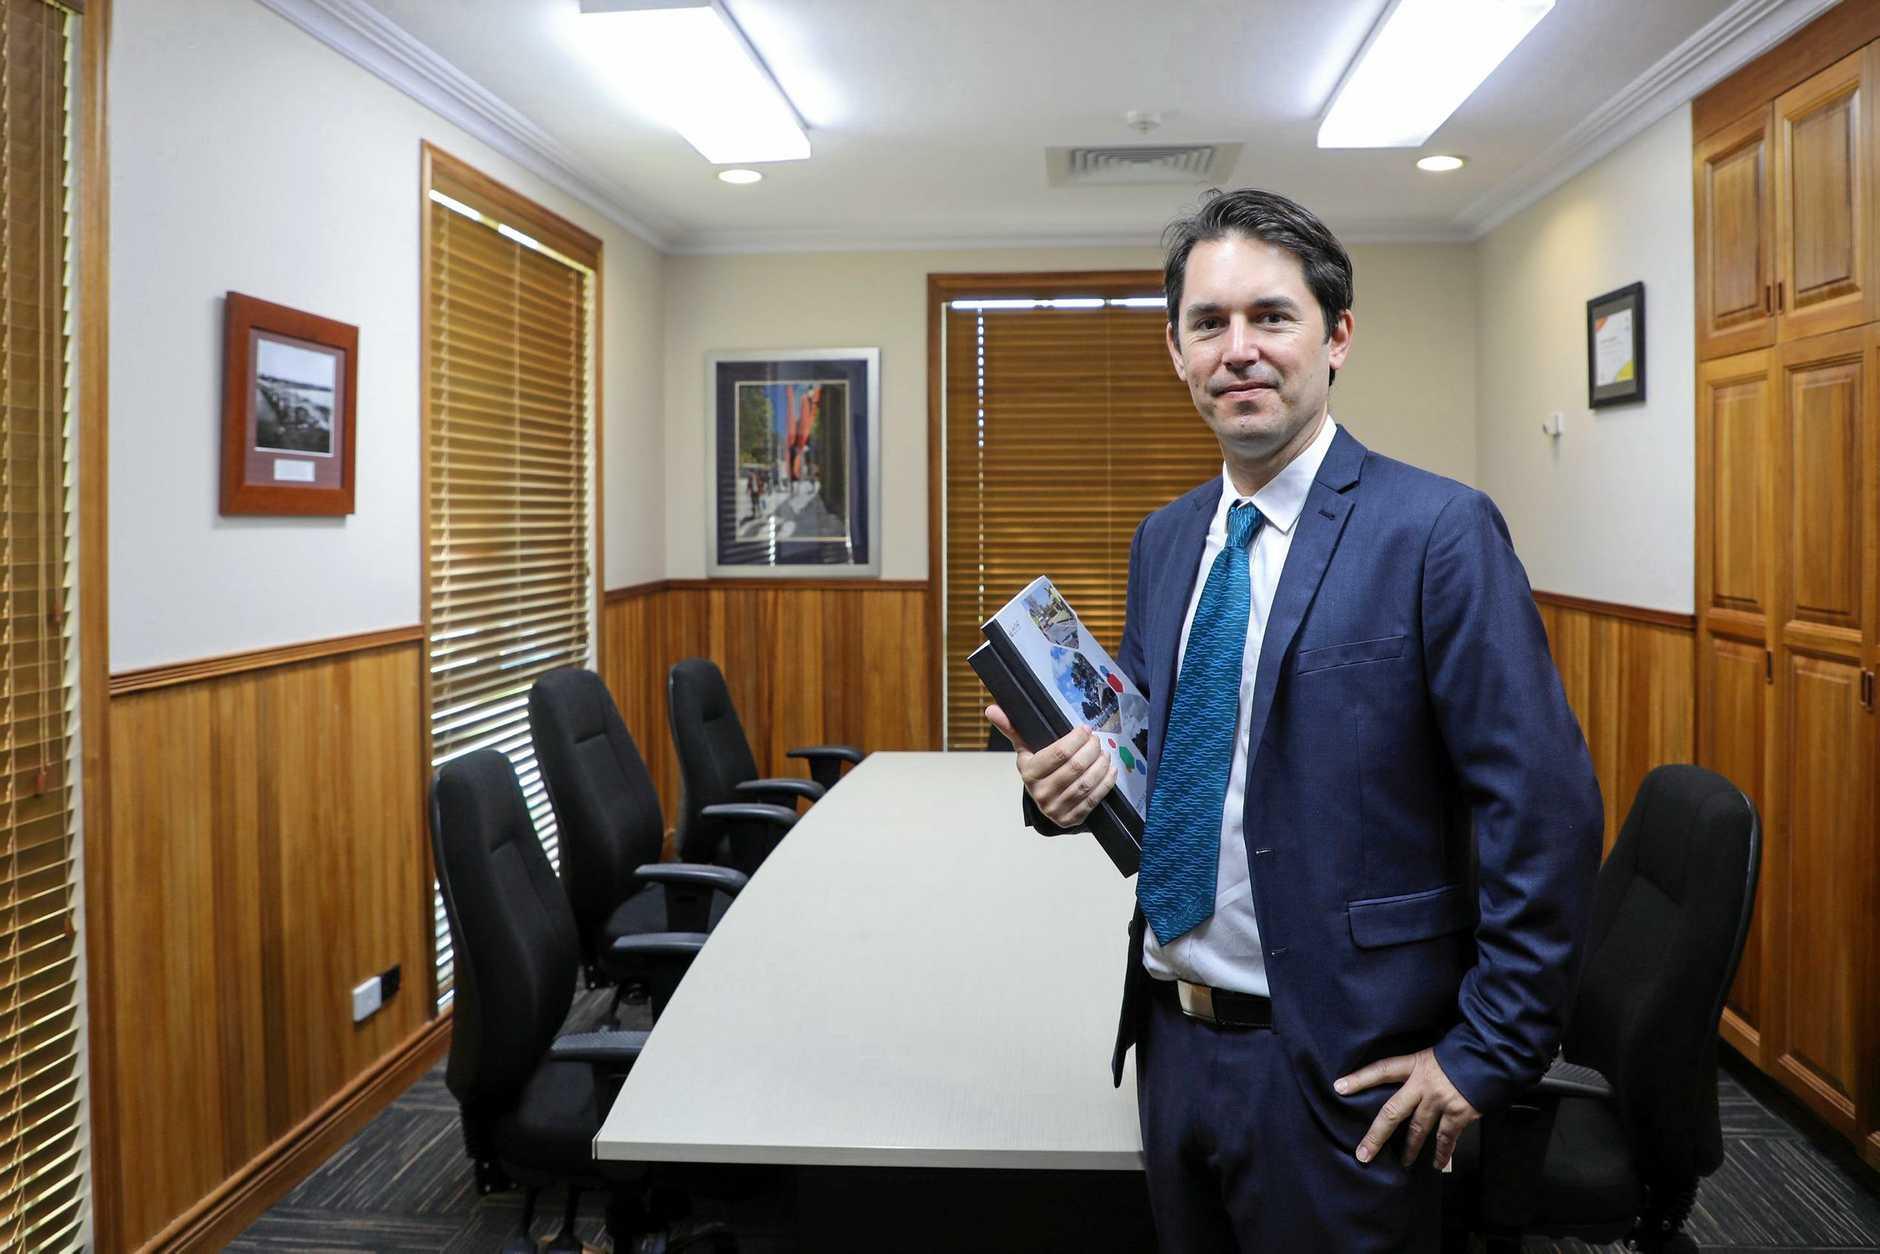 Fraser Coast Mayor George Seymour